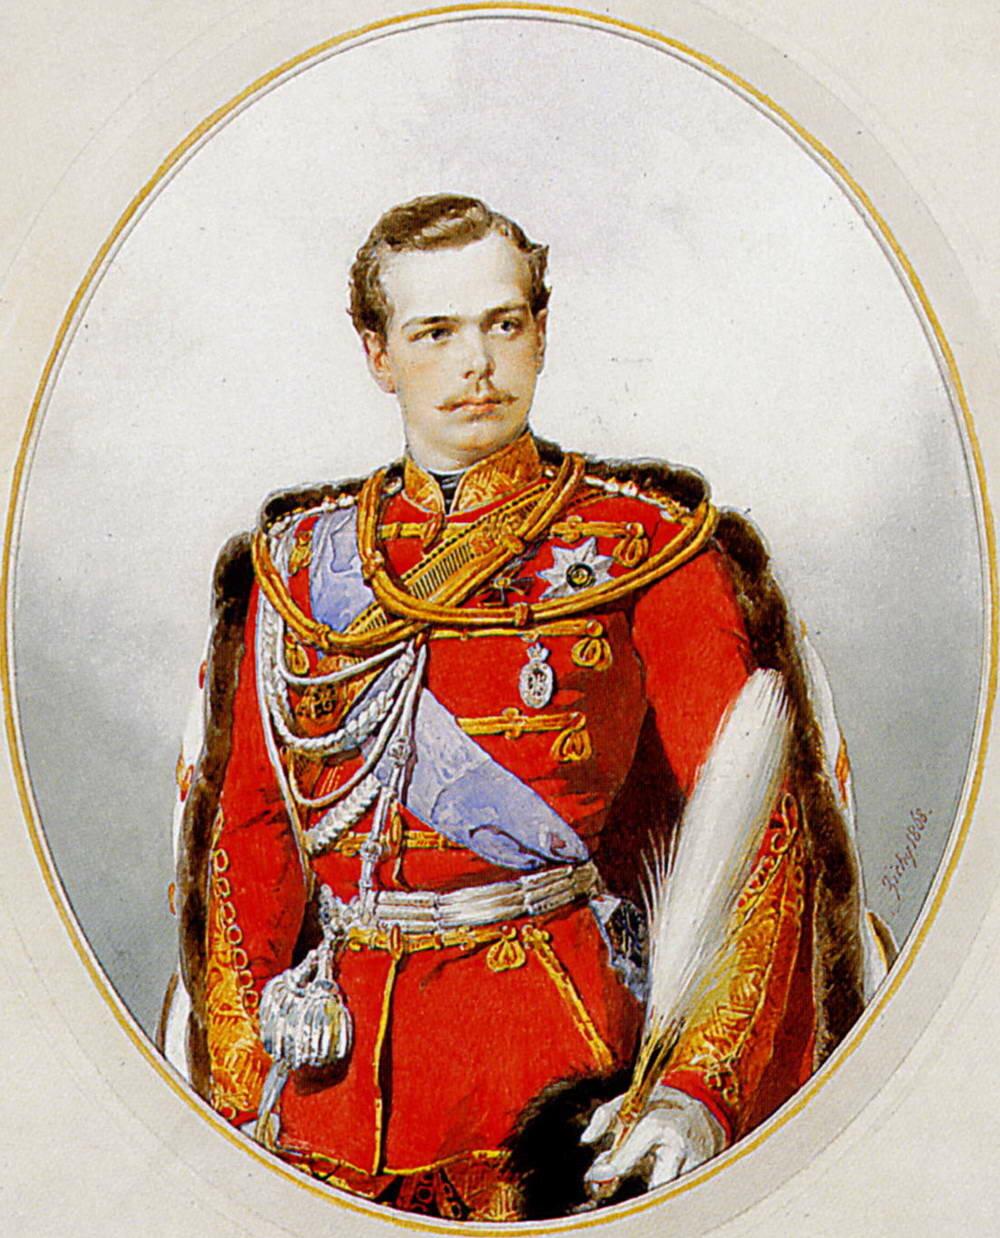 Портрет наследника цесаревича великого князя Александра Александровича, шефа лейб-гвардии Гусарского полка, в мундире полка